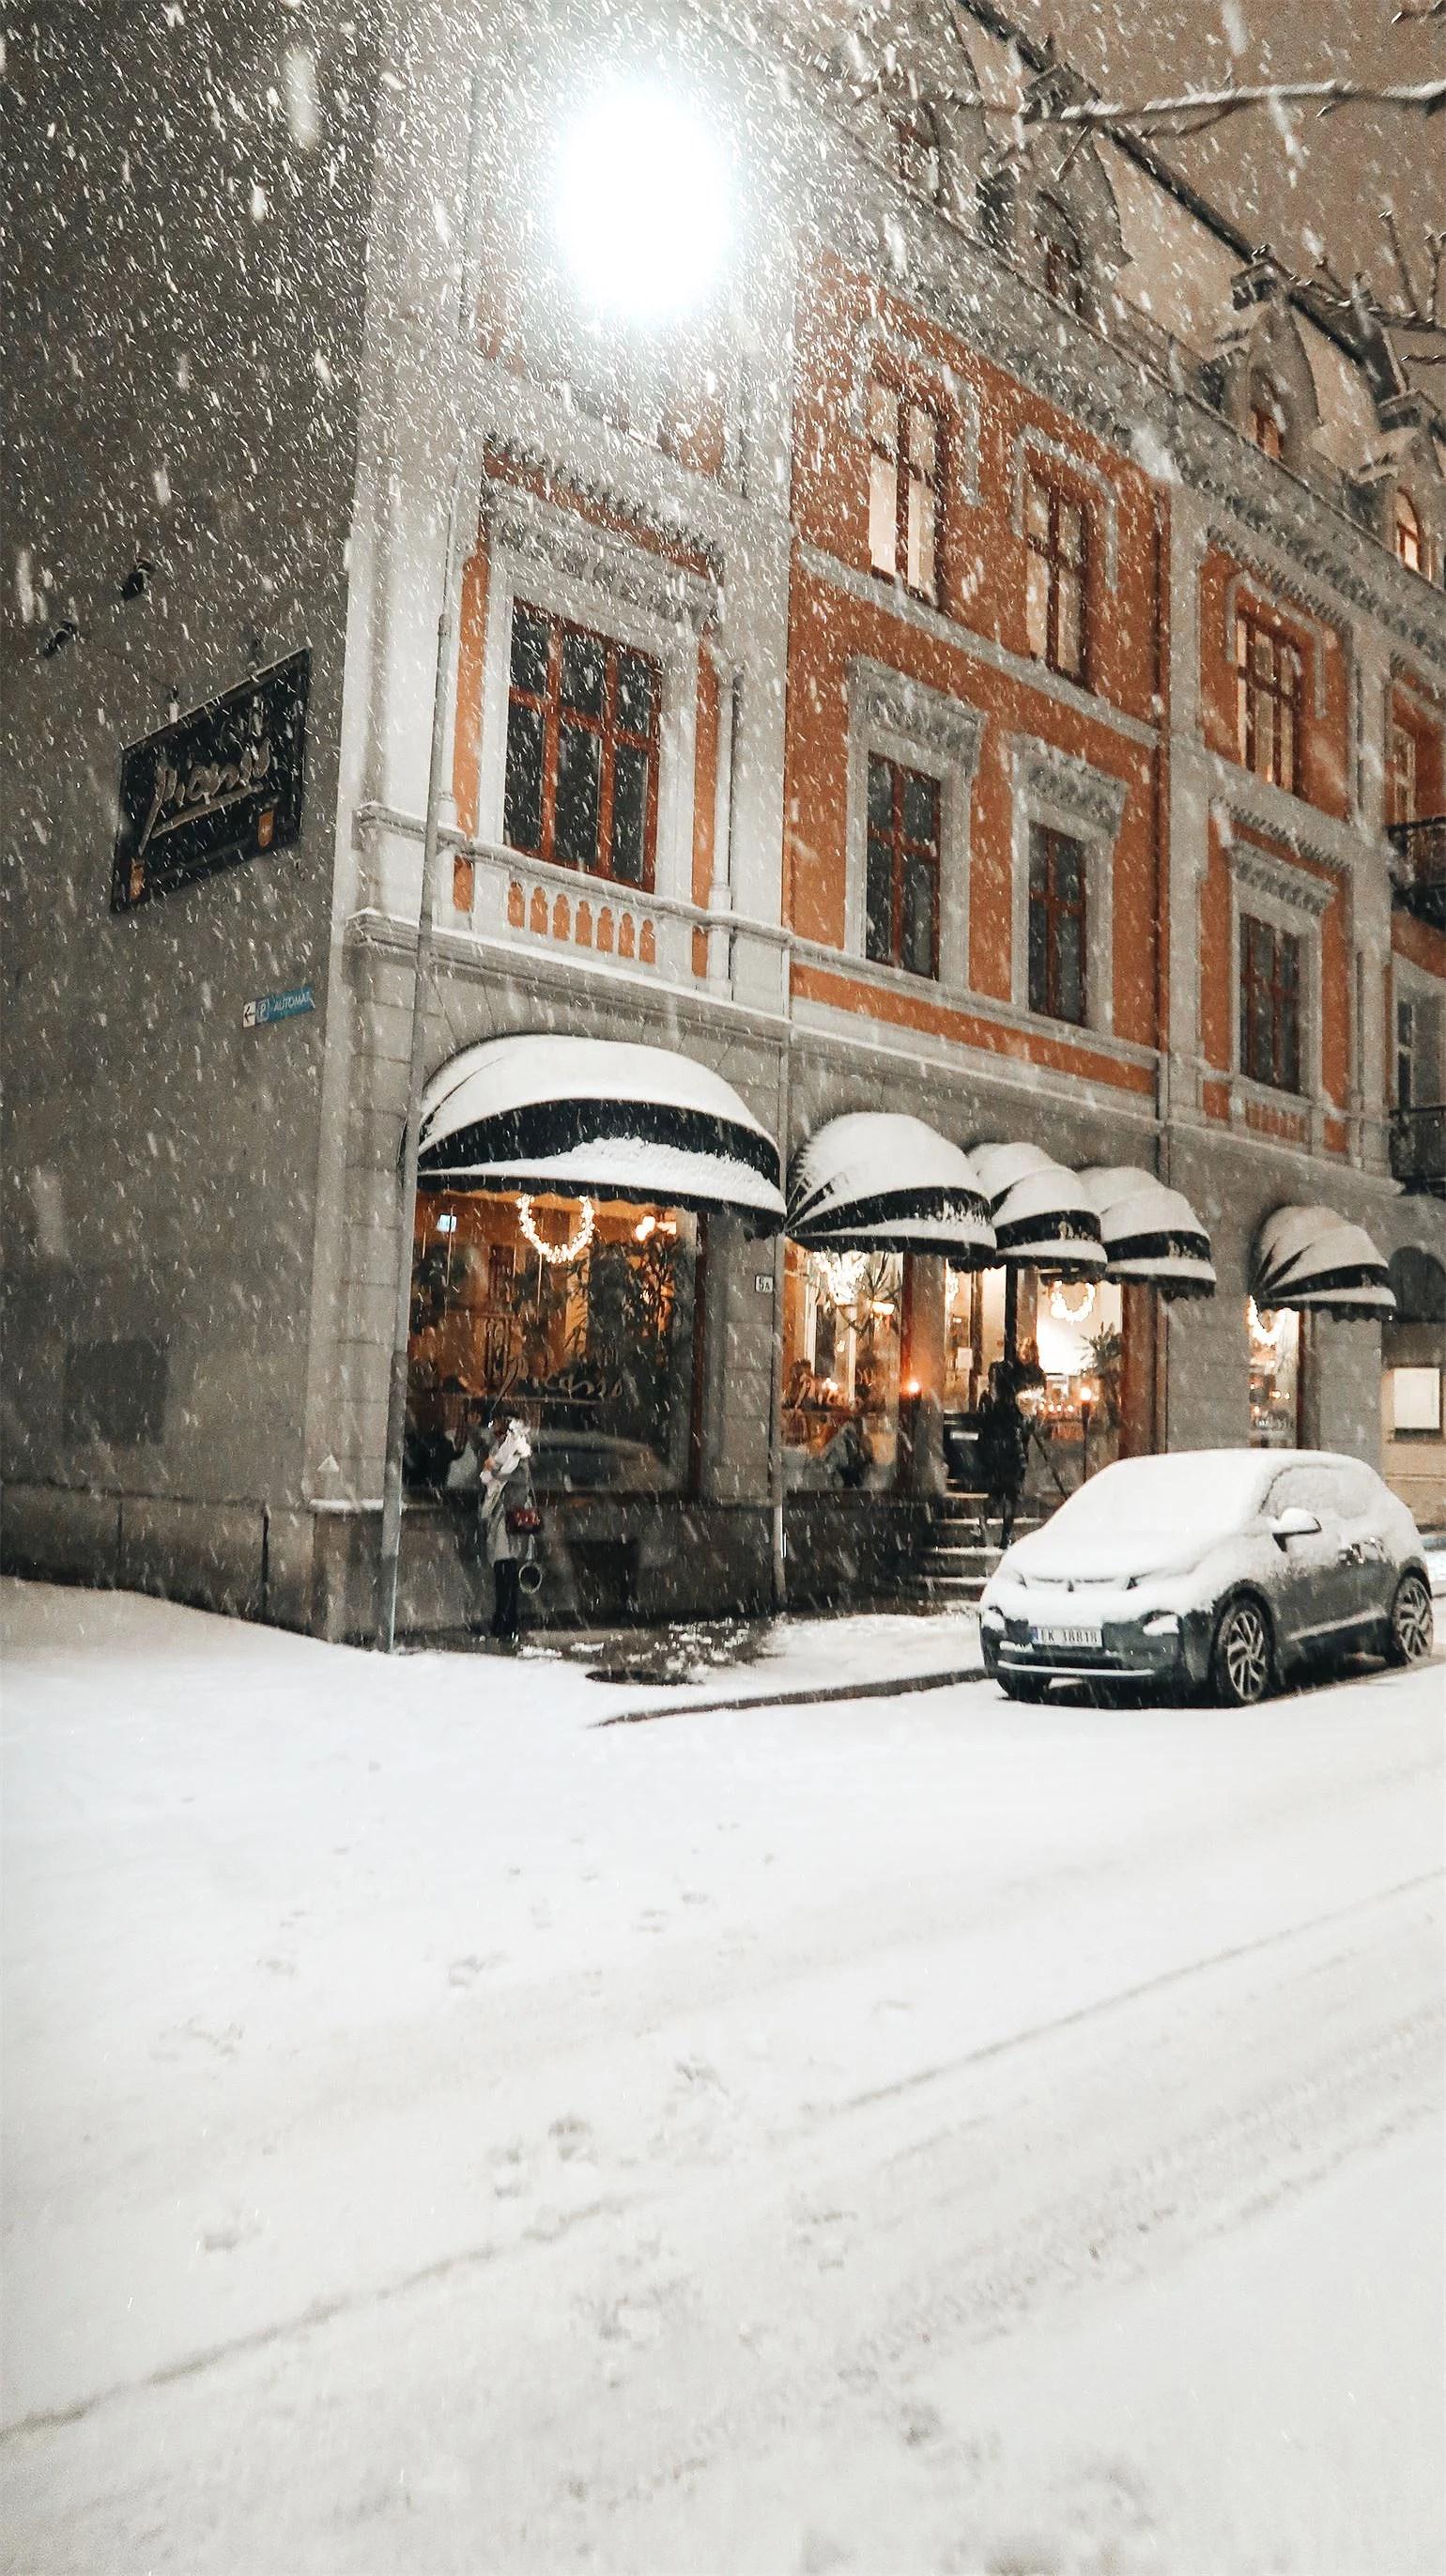 LET IT SNOW, LET IT SNOW, LET IT SNOW..